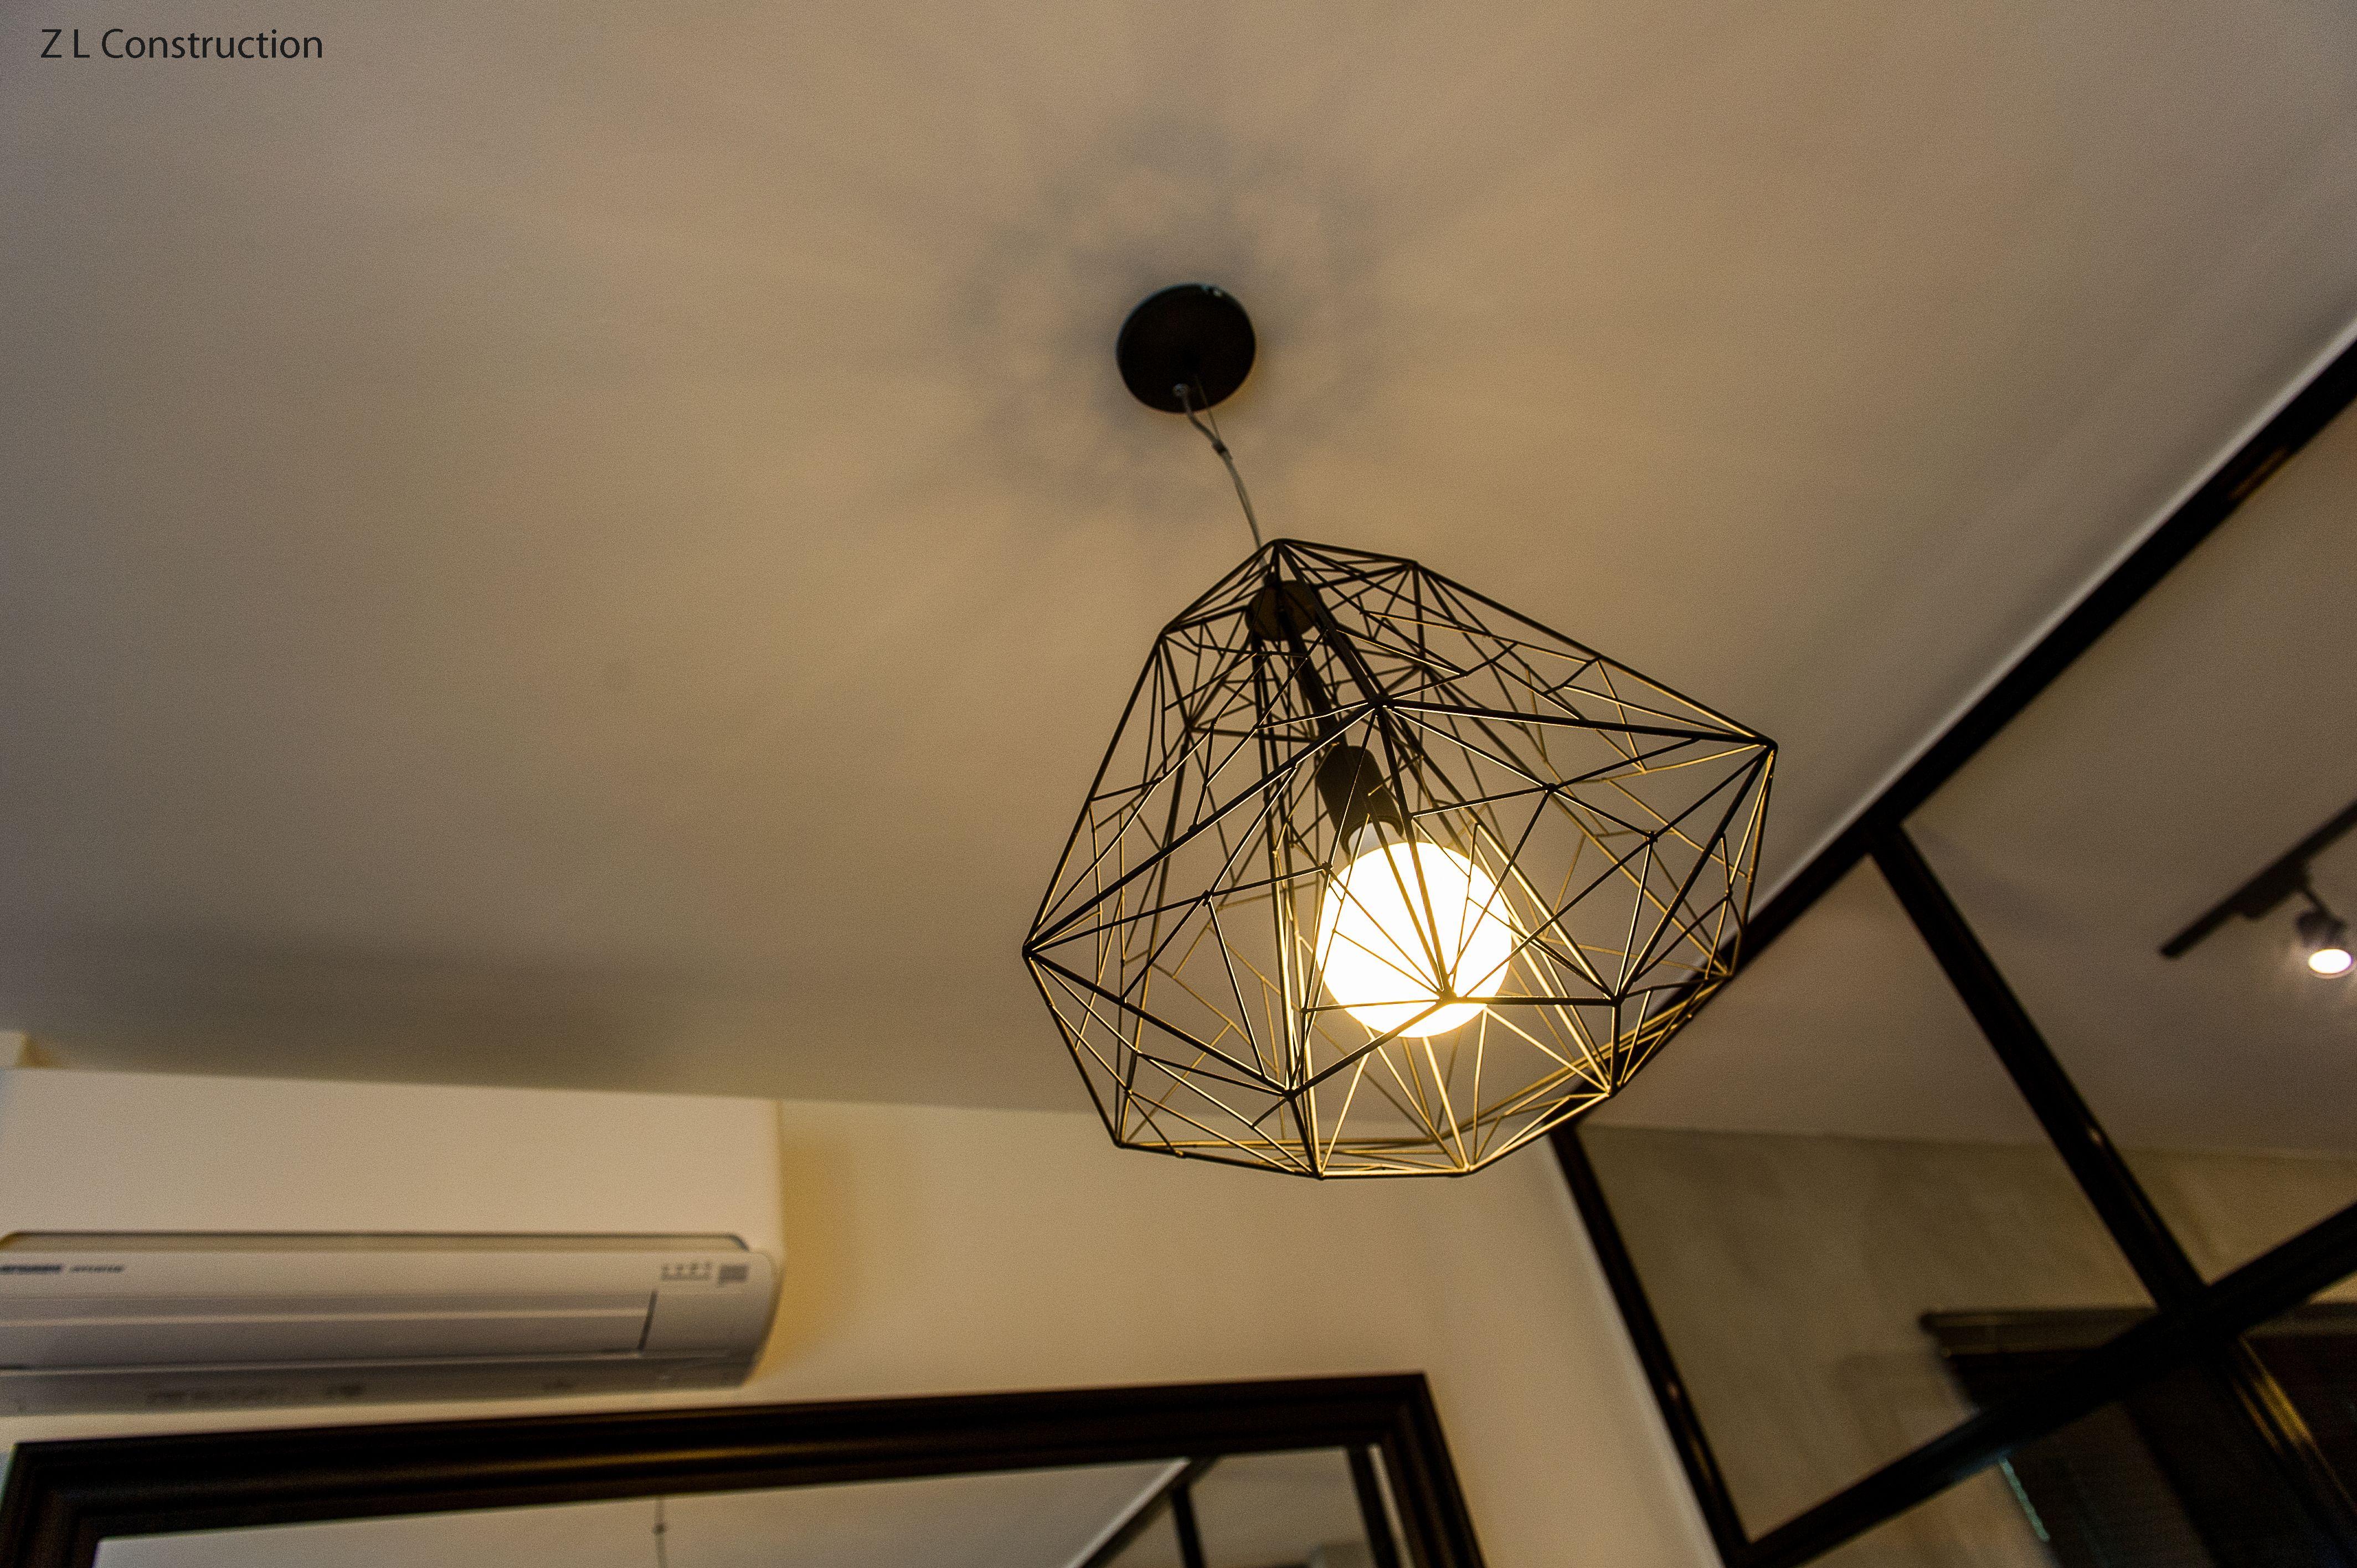 Z L Construction Singapore Industrial Lattice Ceiling Light In Black